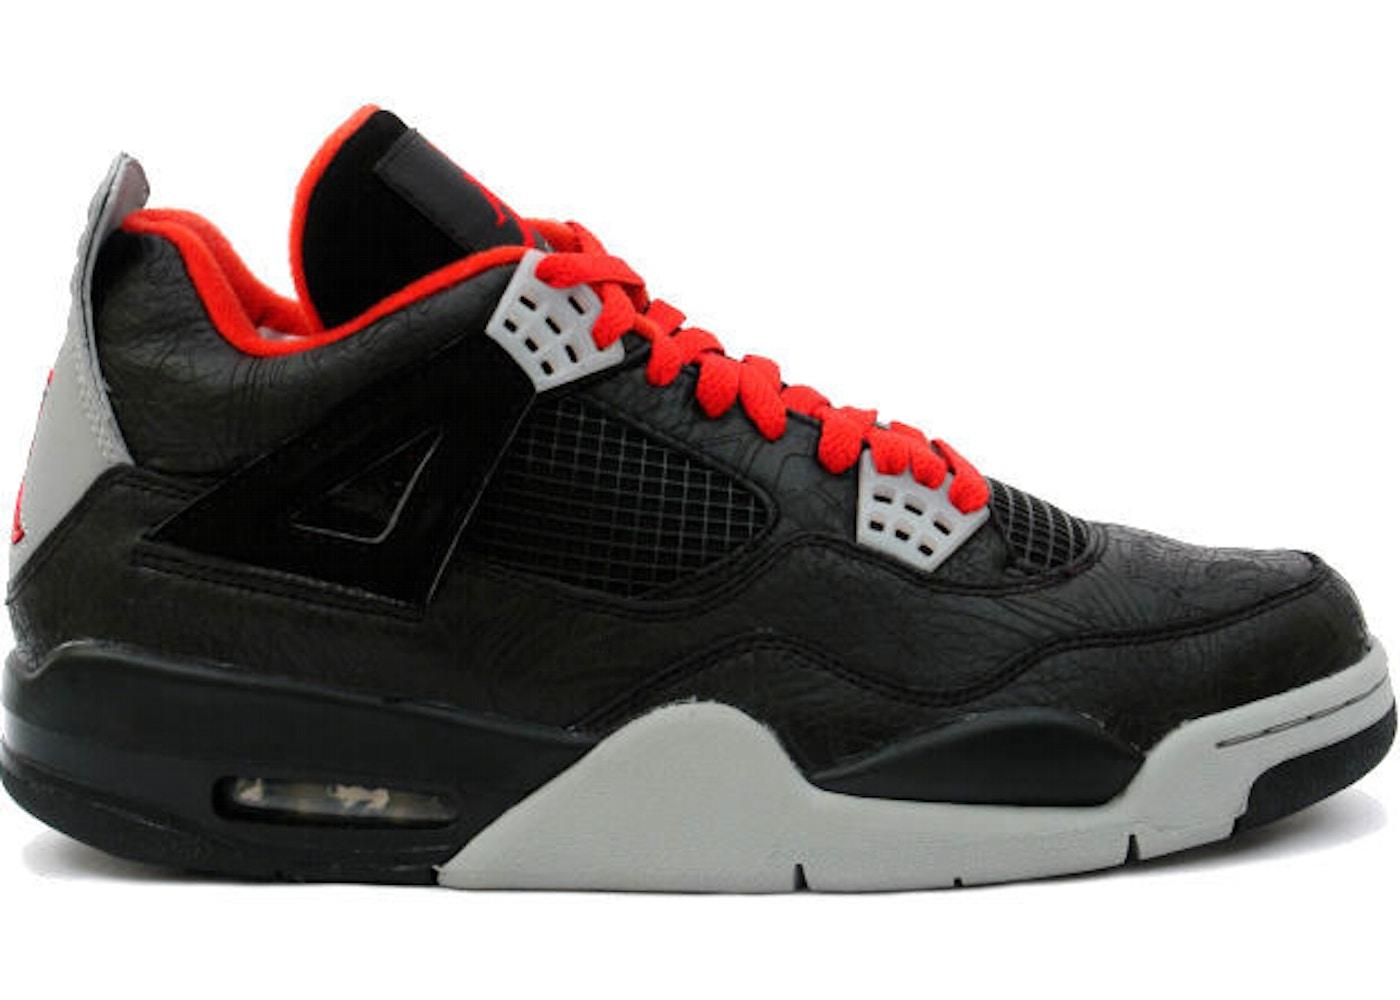 37ae86faac4e Jordan 4 Retro Black Laser - 312255-061